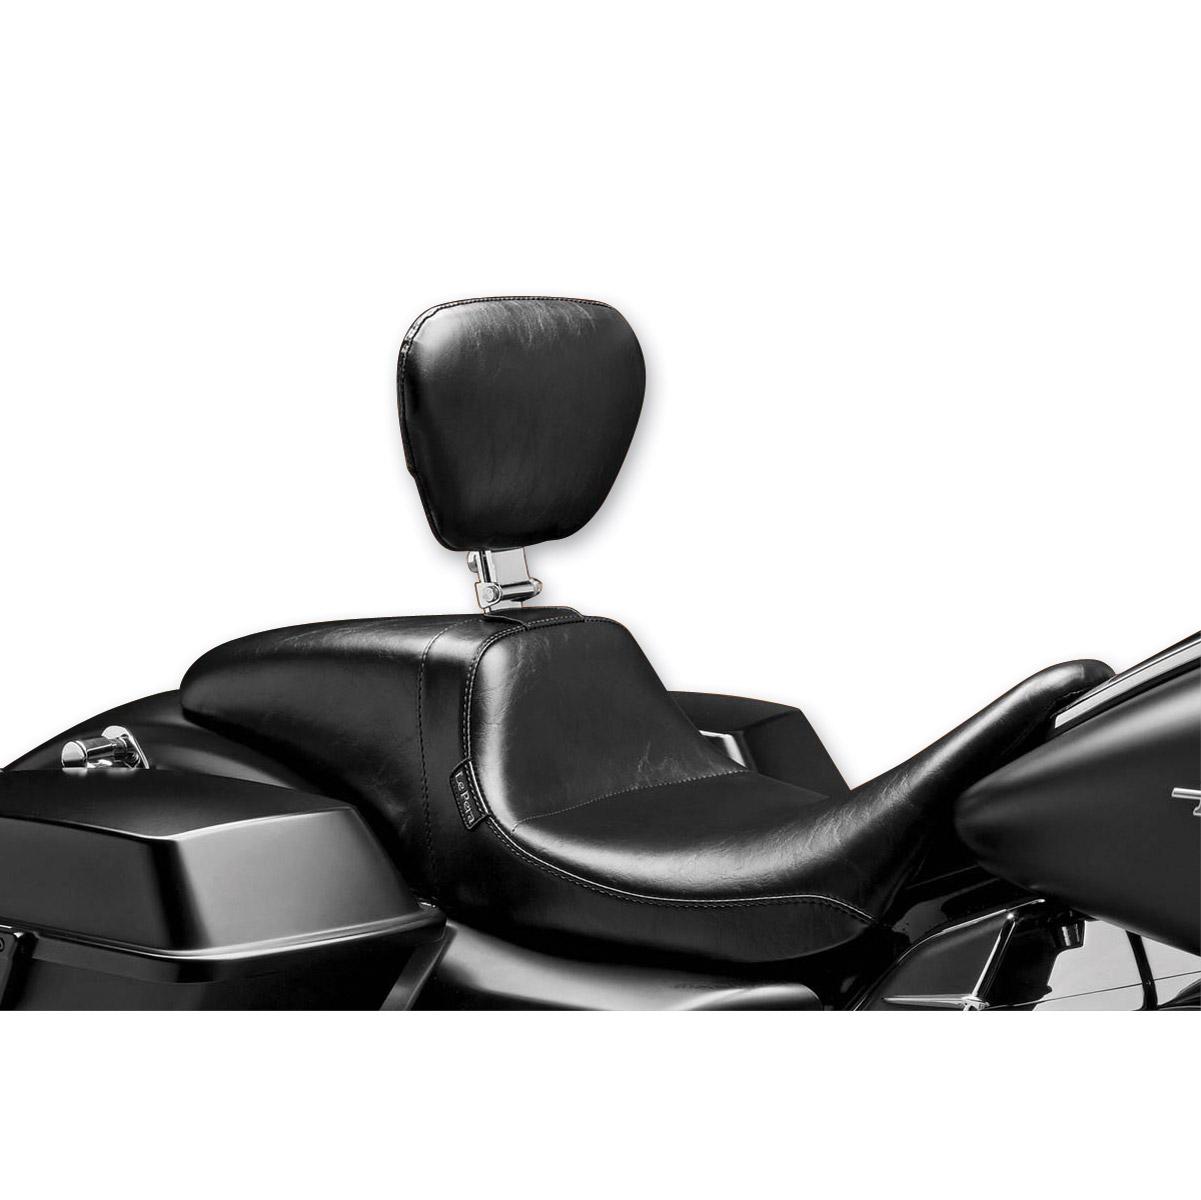 Le Pera Daytona Sport Seat with Backrest